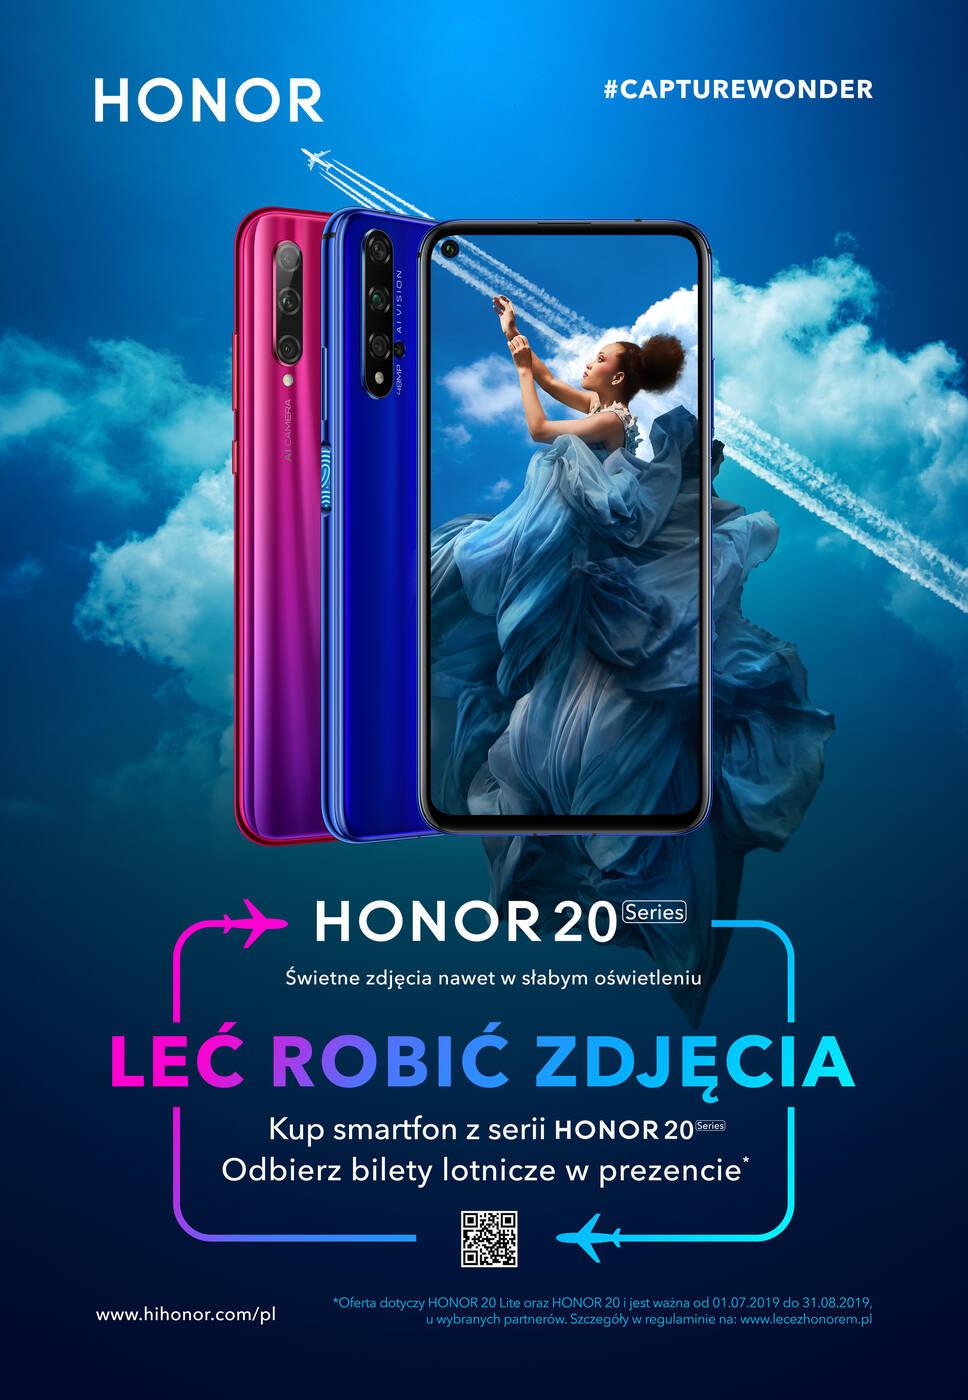 Honor 20, premiera Honor 20, data premiery Honor 20, Polska Honor 20, kiedy Honor 20, promocja Honor 20, bilety Honor 20, bilety lotnicze Honor 20,